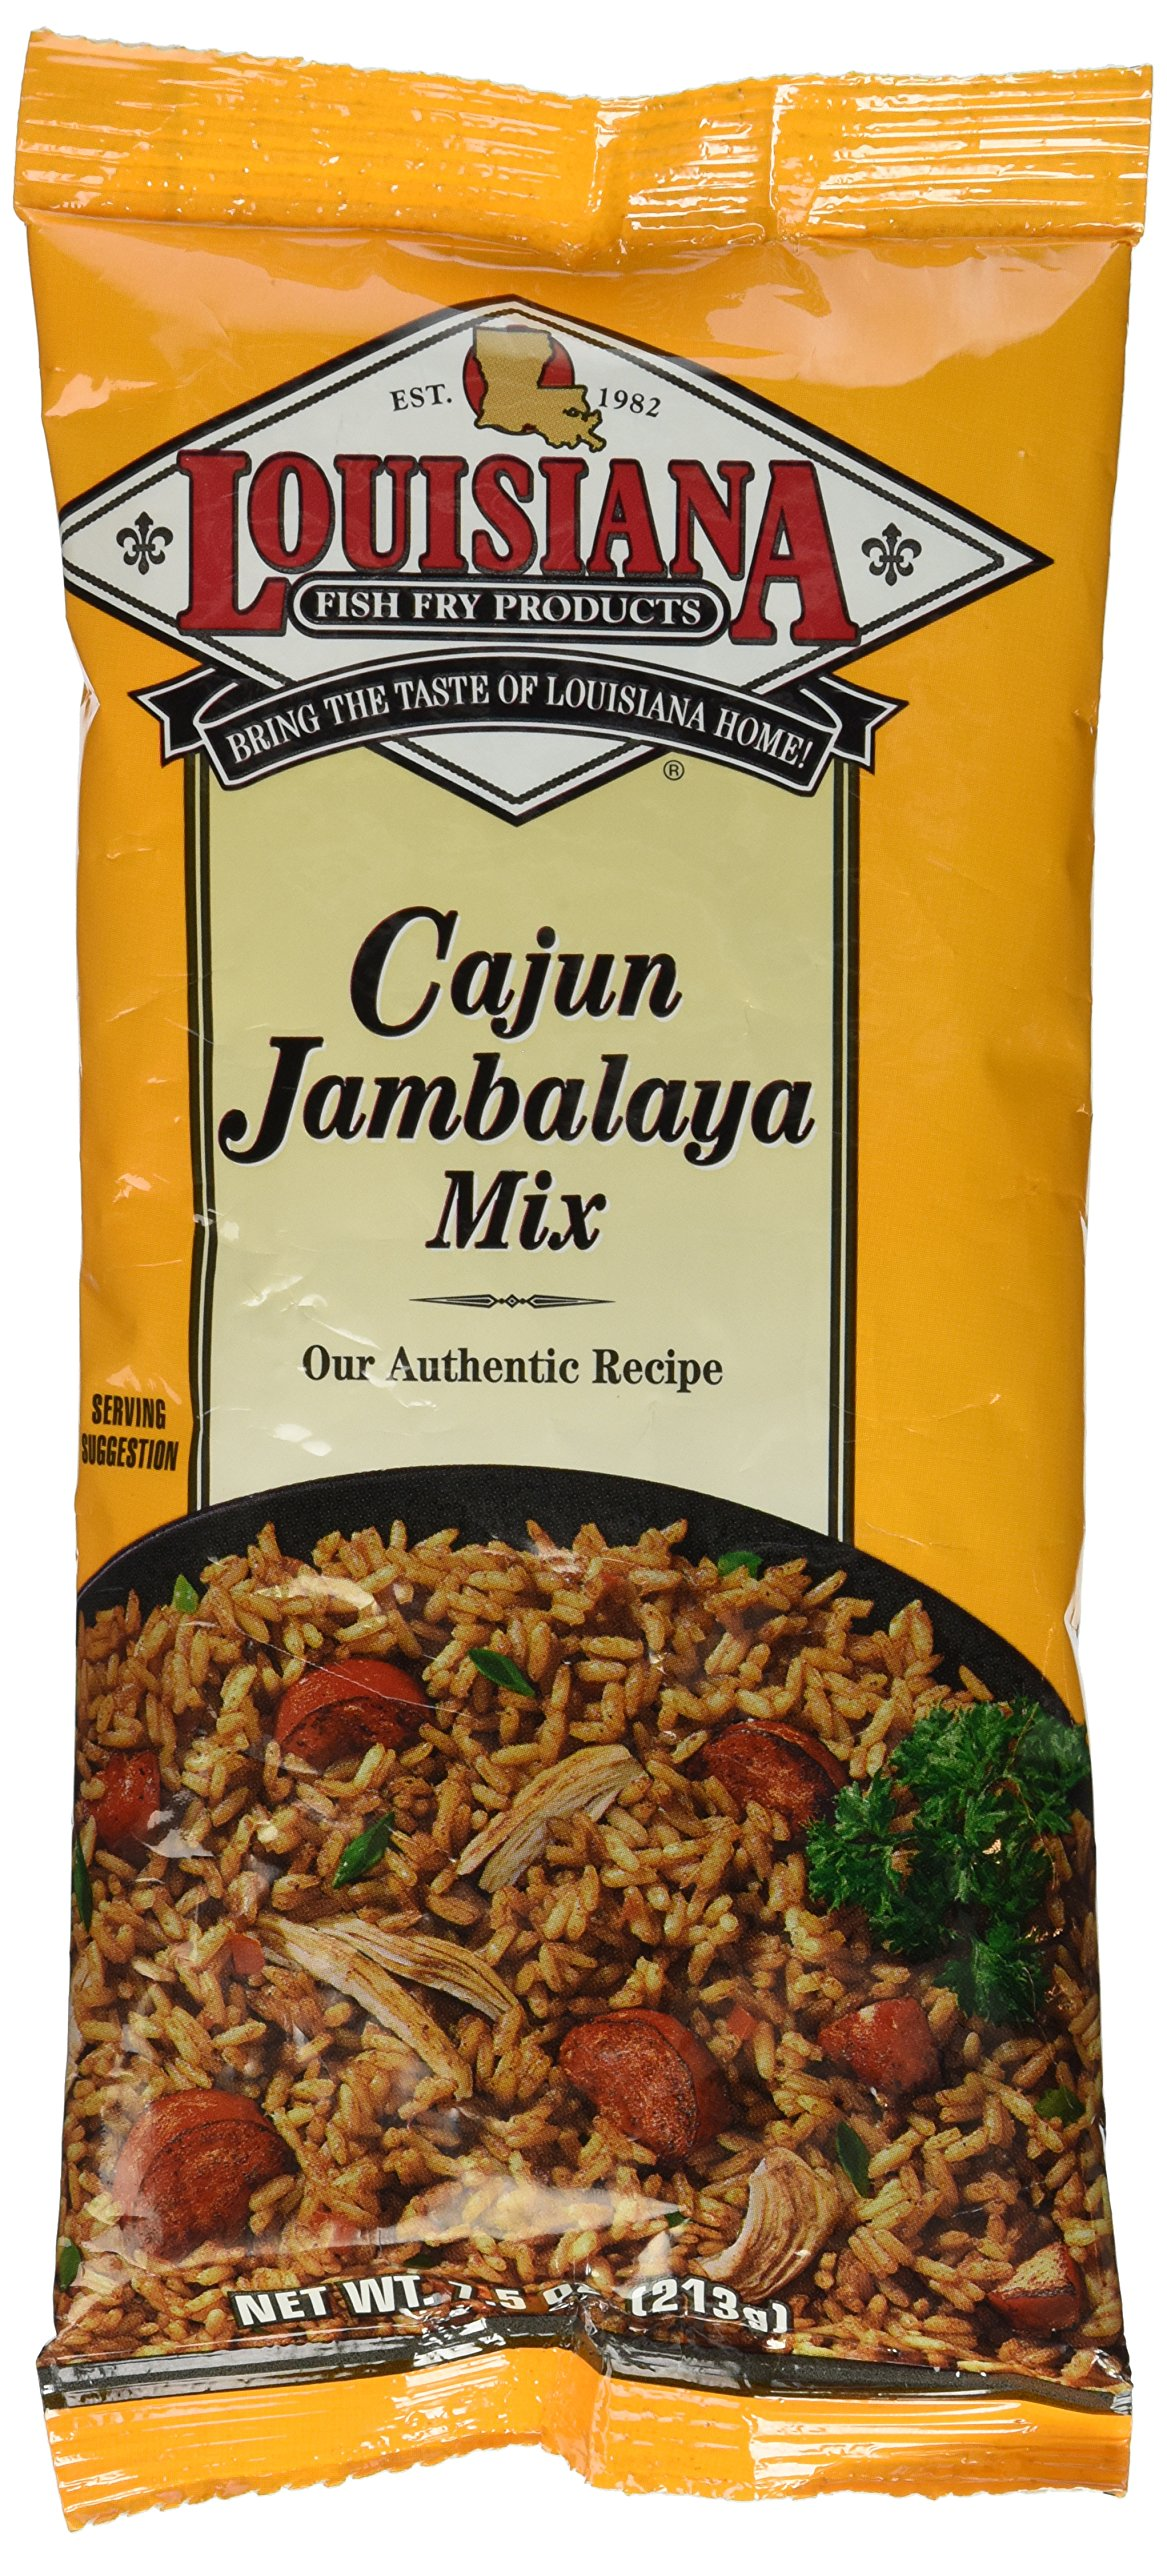 Louisiana fish fry etouffee mix reviews for Fish fry mix